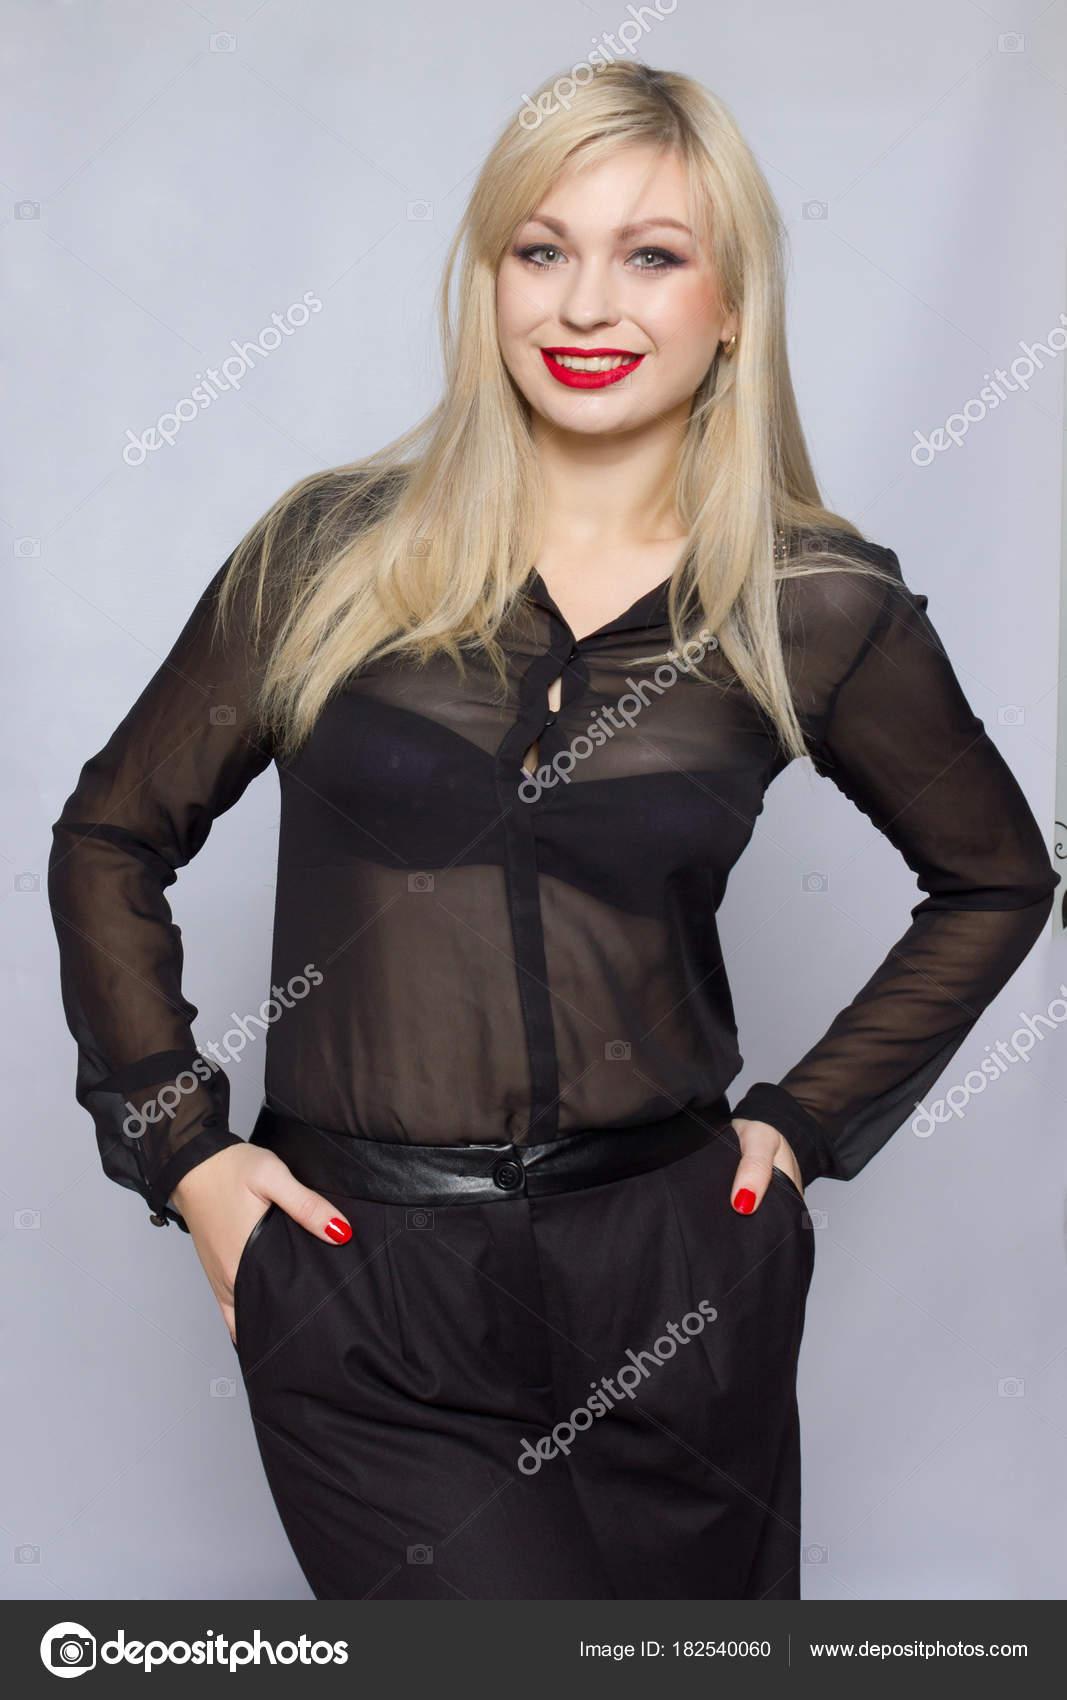 7eced732aefd0 Chica Guapa Sexy Hermosa Usar Traje Negro Blusa Pantalones Dama — Fotos de  Stock